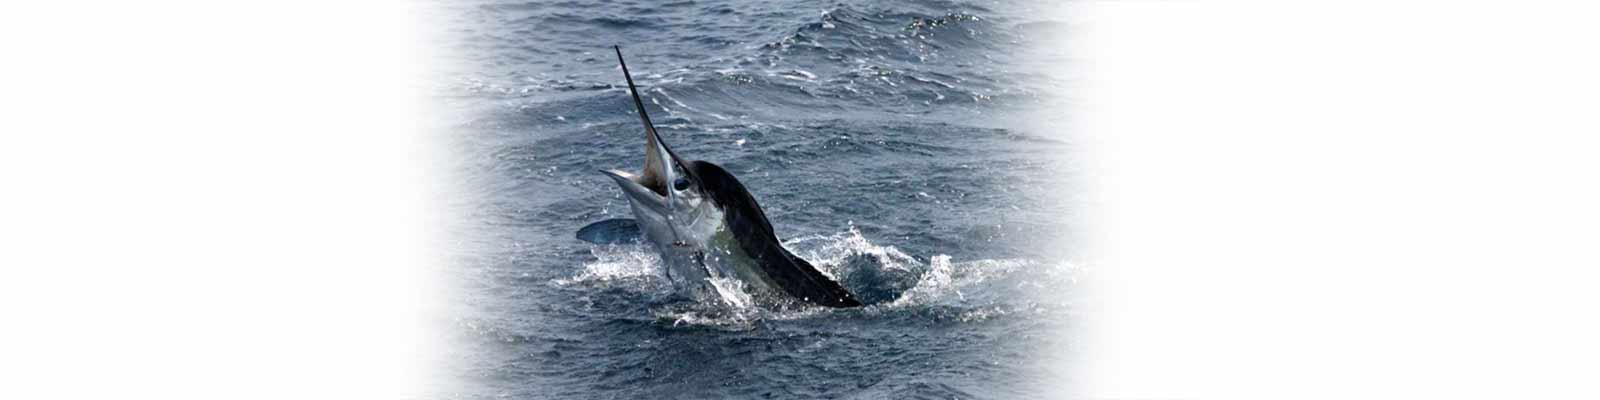 Virginia beach fishing charters aquaman sportfishing for Deep sea fishing va beach